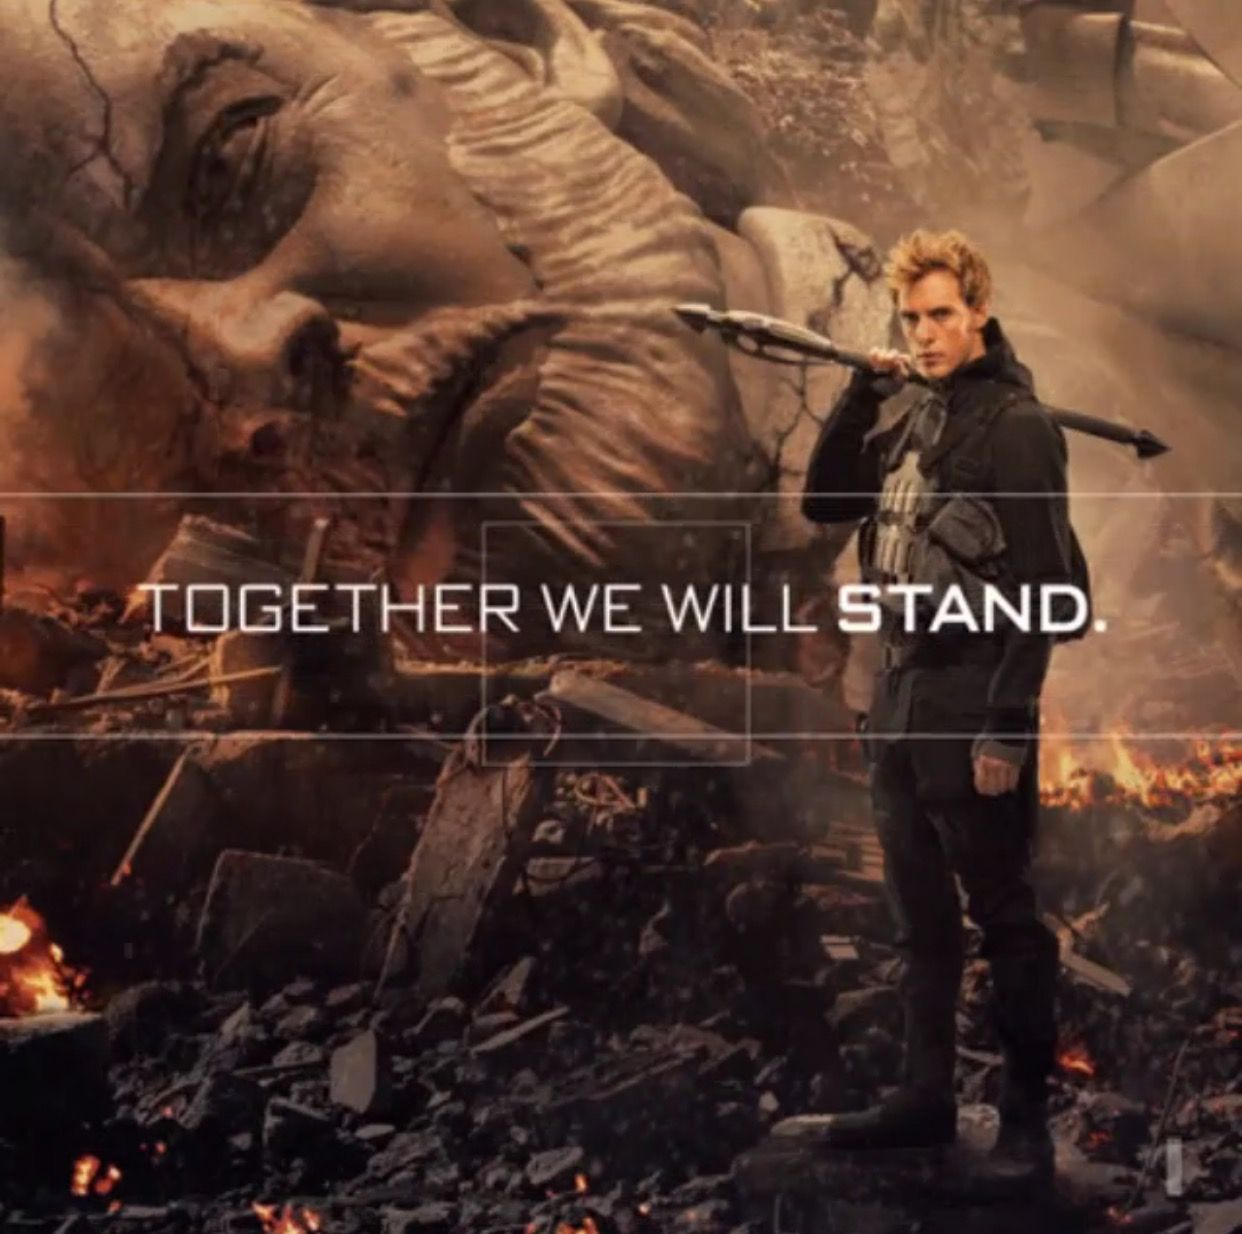 (1/2) We are Panem...  #DownwithSnow #OnePanem